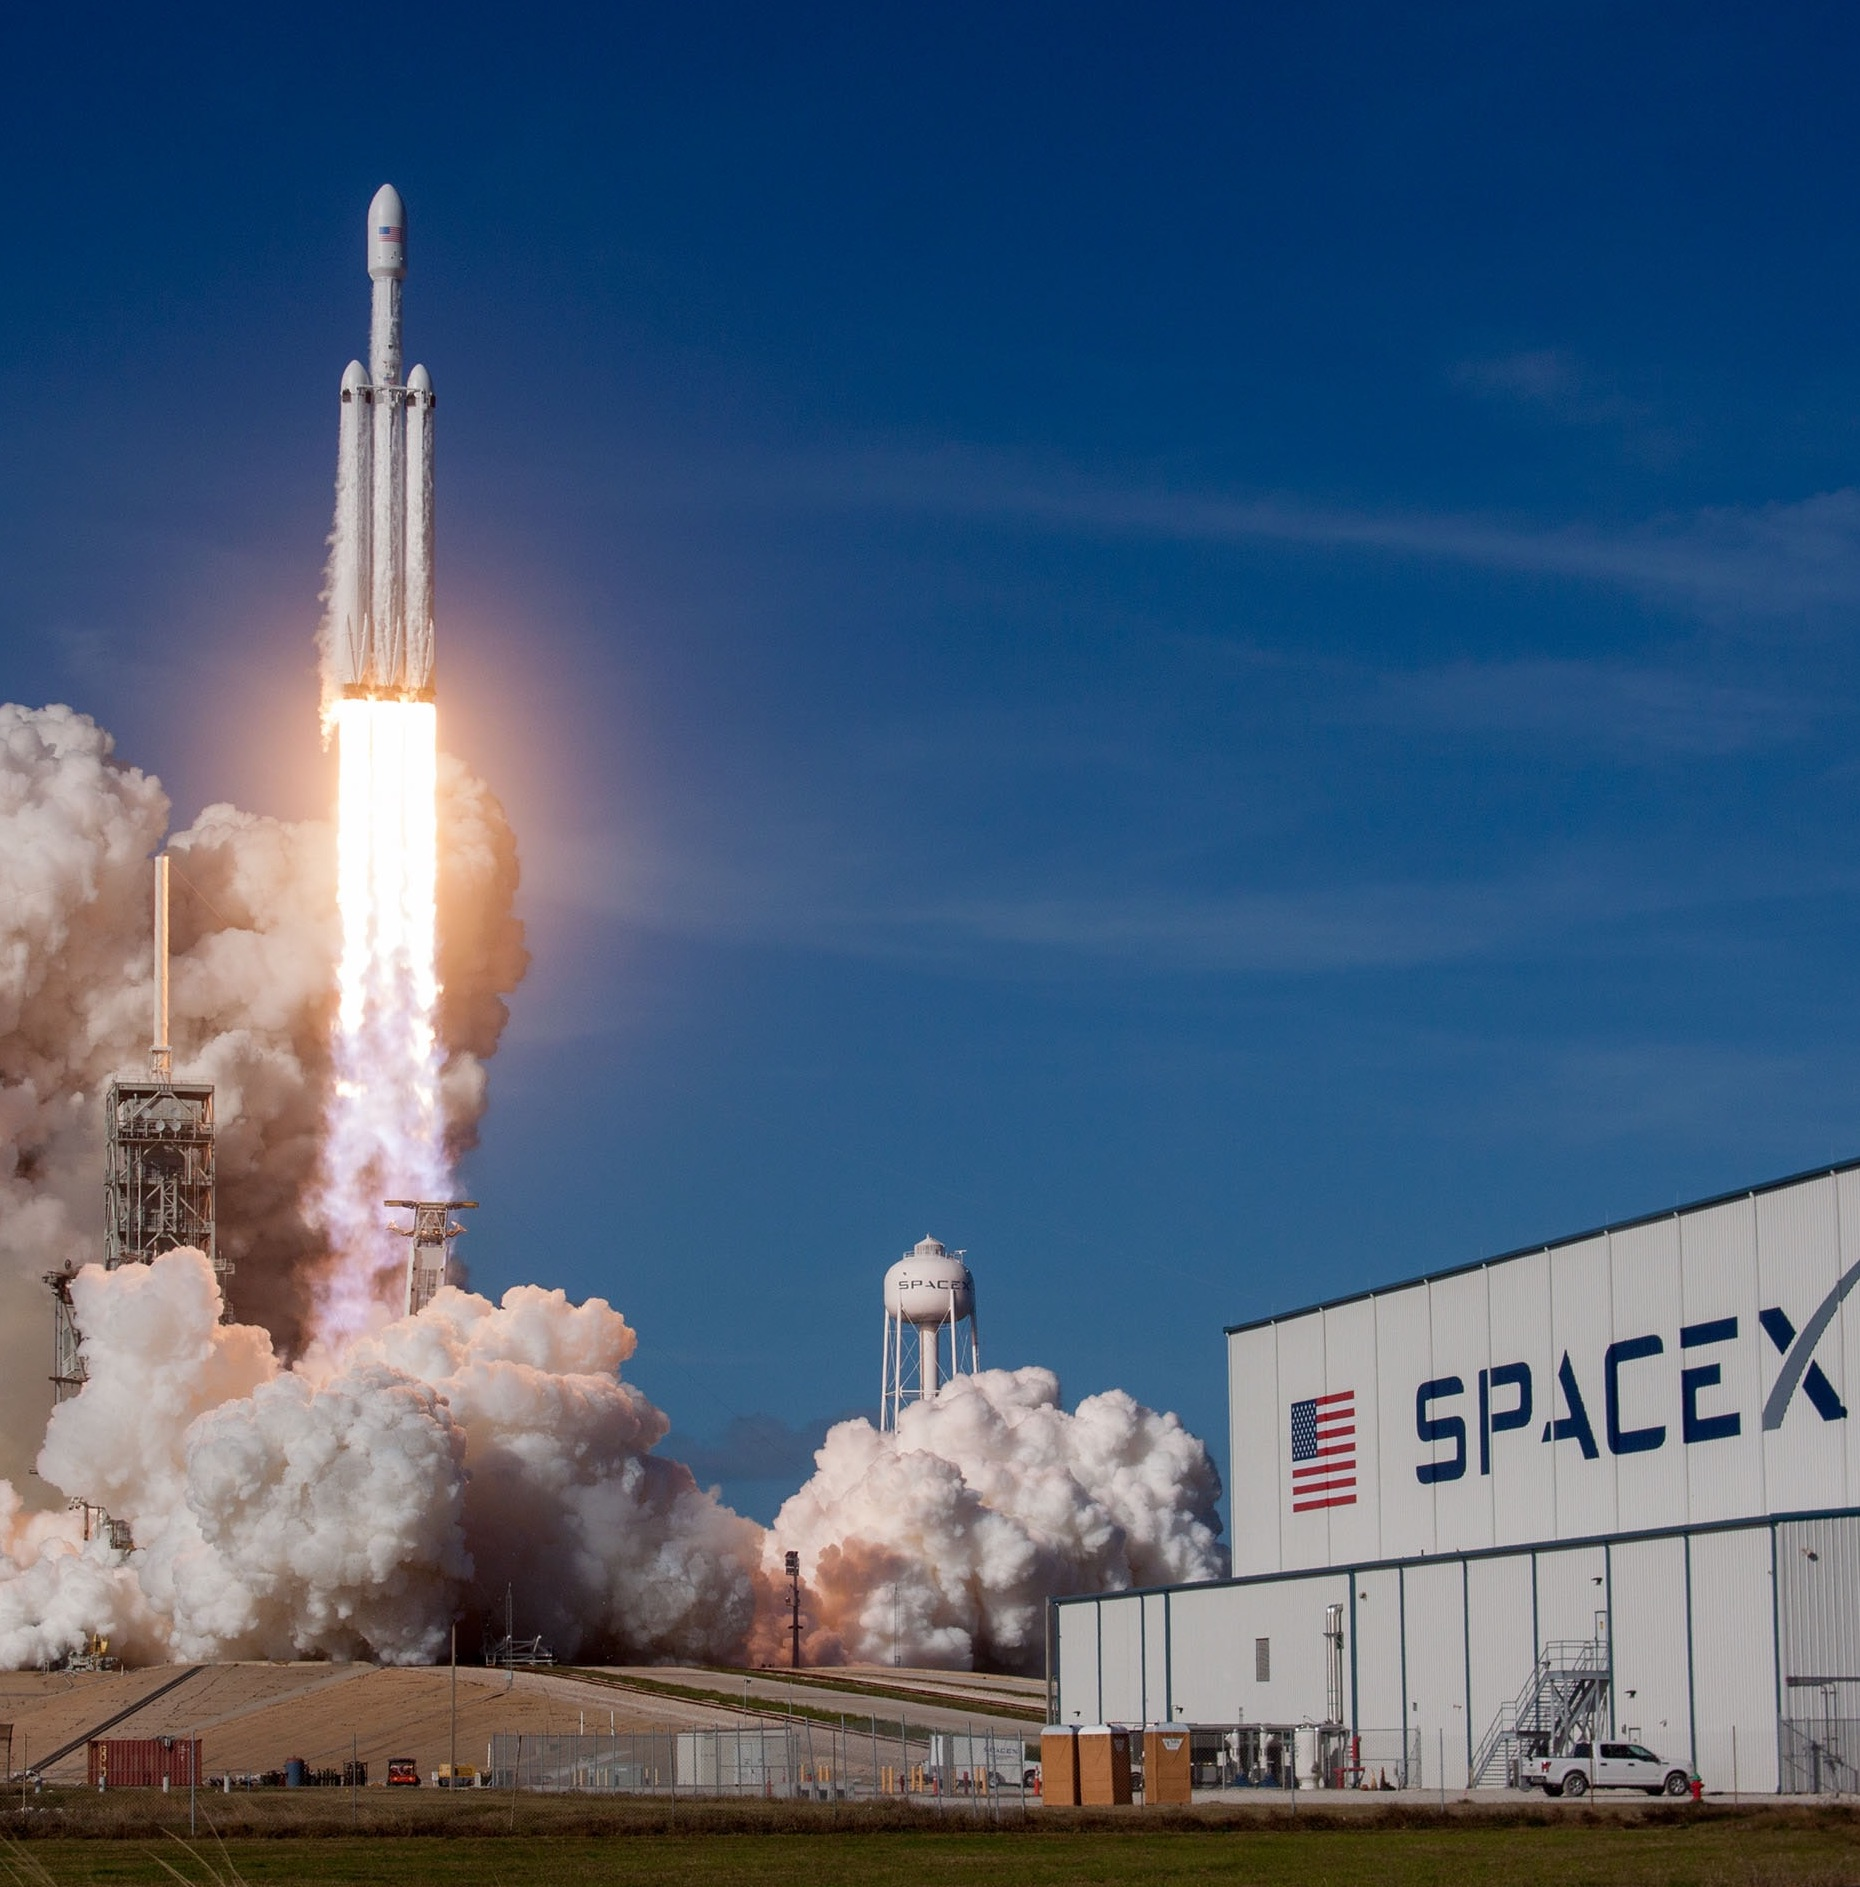 SpaceX rocket blasting off